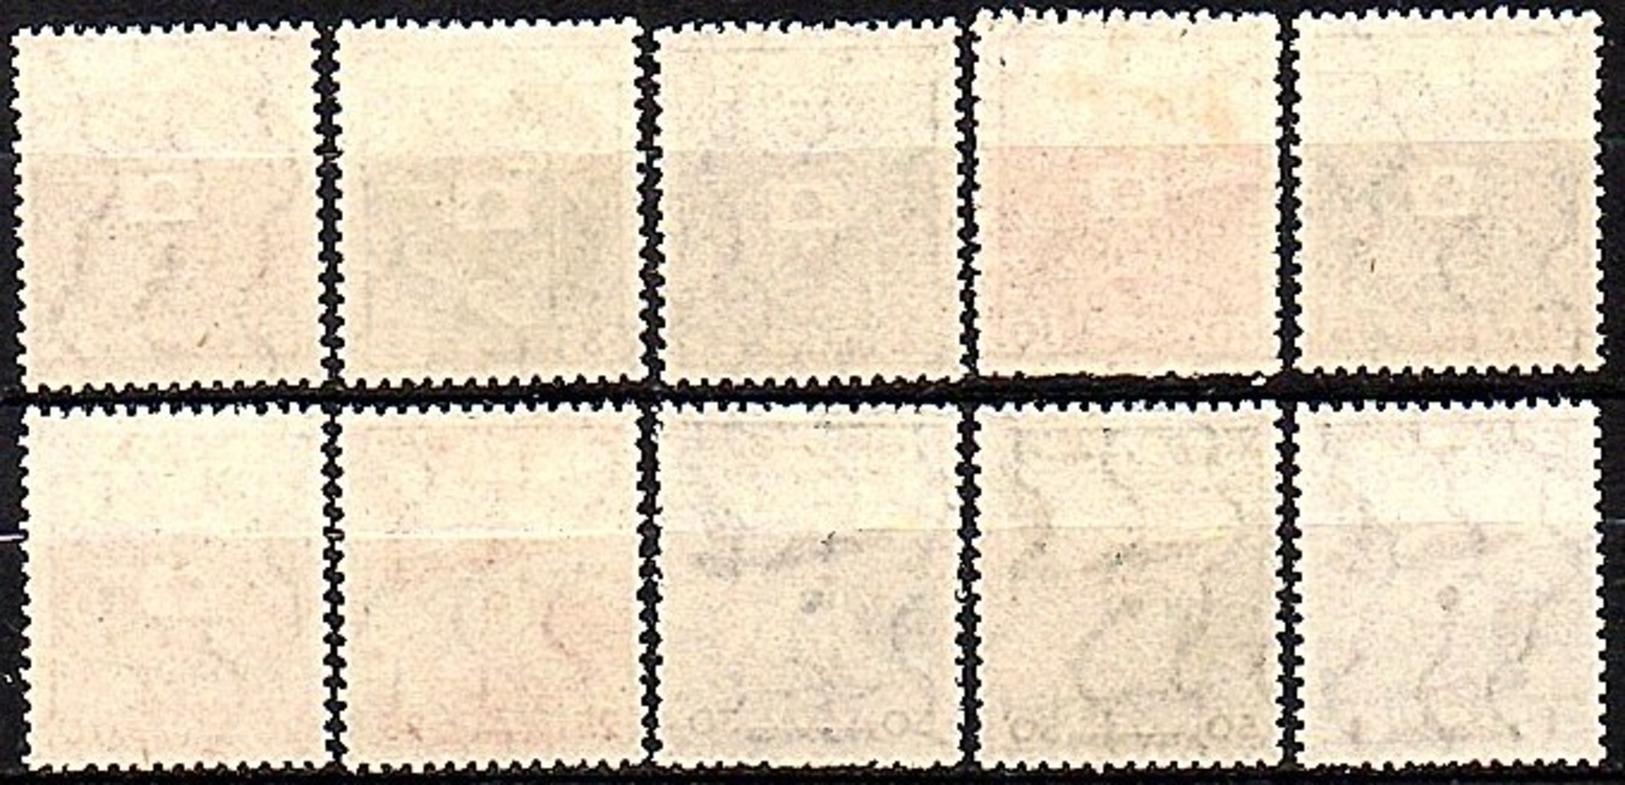 1943 Japanese Occupation Borneo Complete Set MH Very Fine (234) - Nederlands-Indië